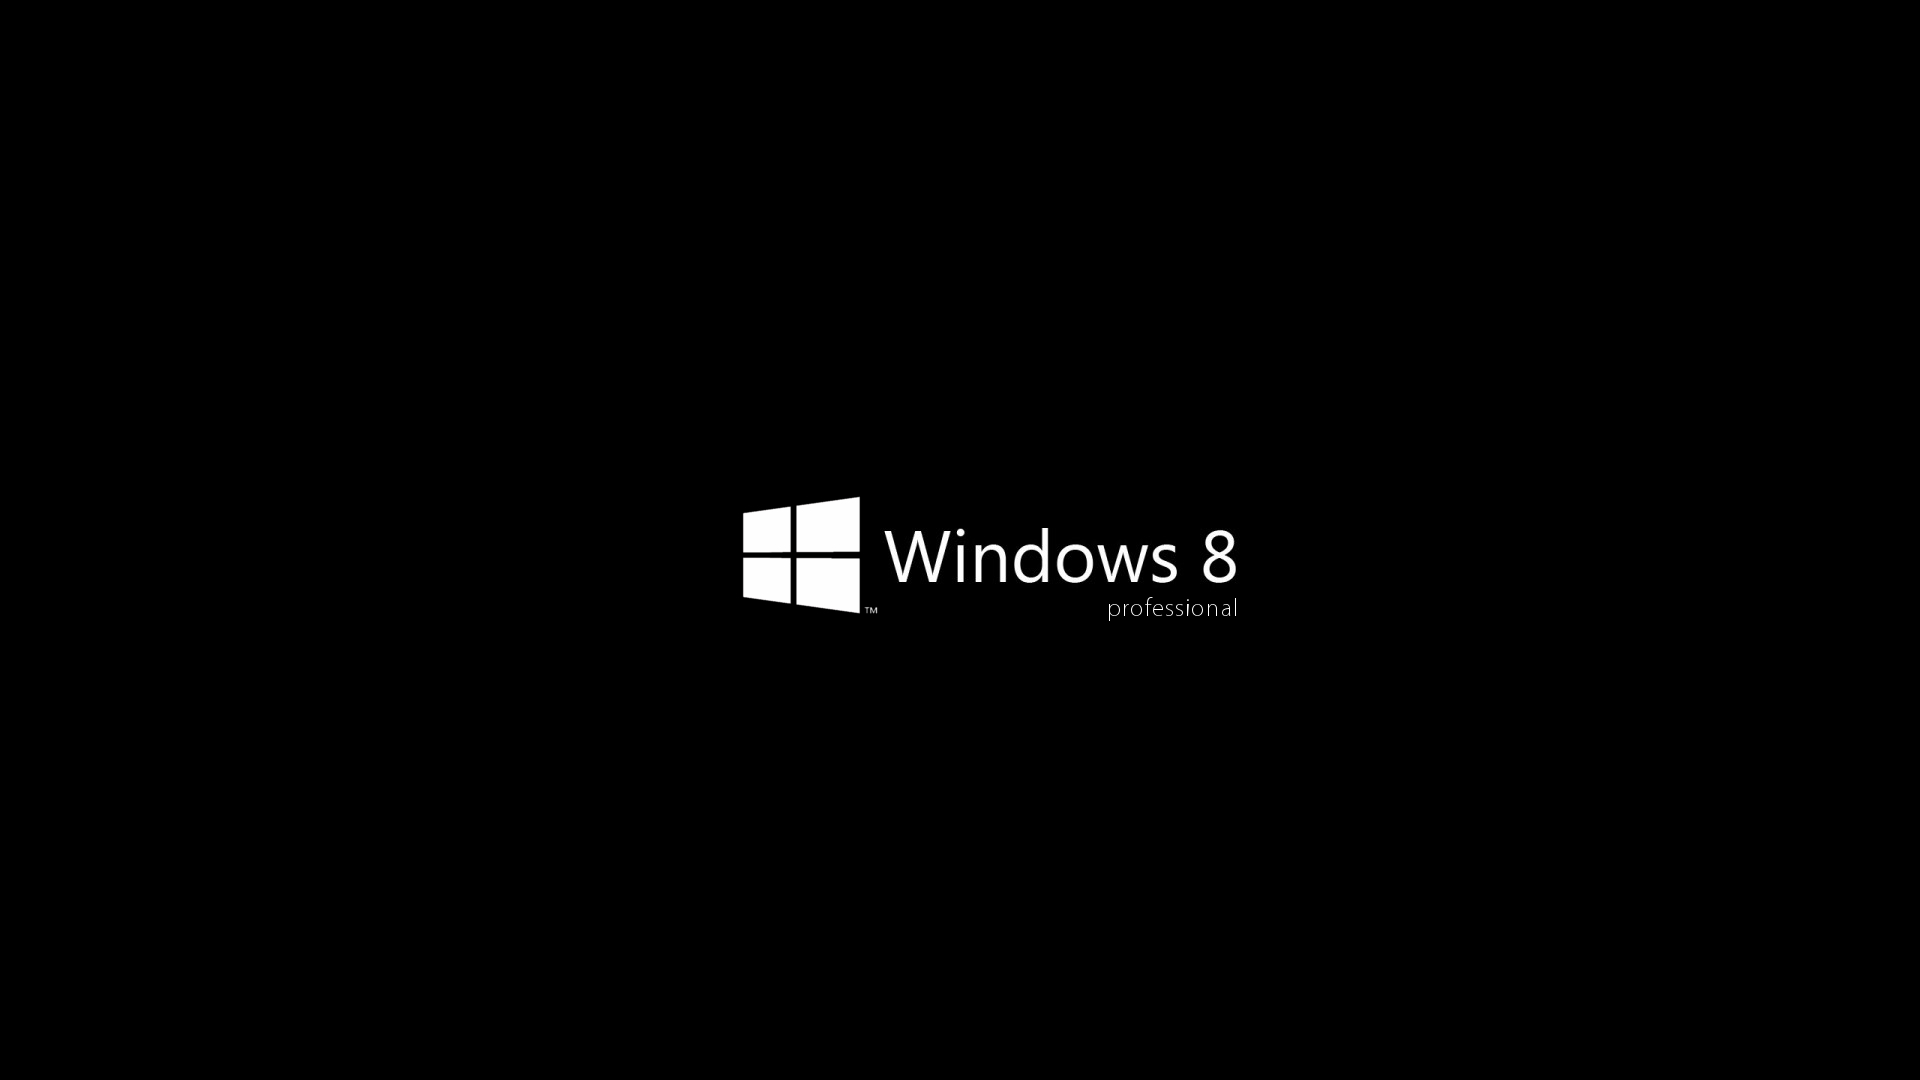 Windows 8 Black Wallpaper   Wallpaper High Definition High Quality 1920x1080